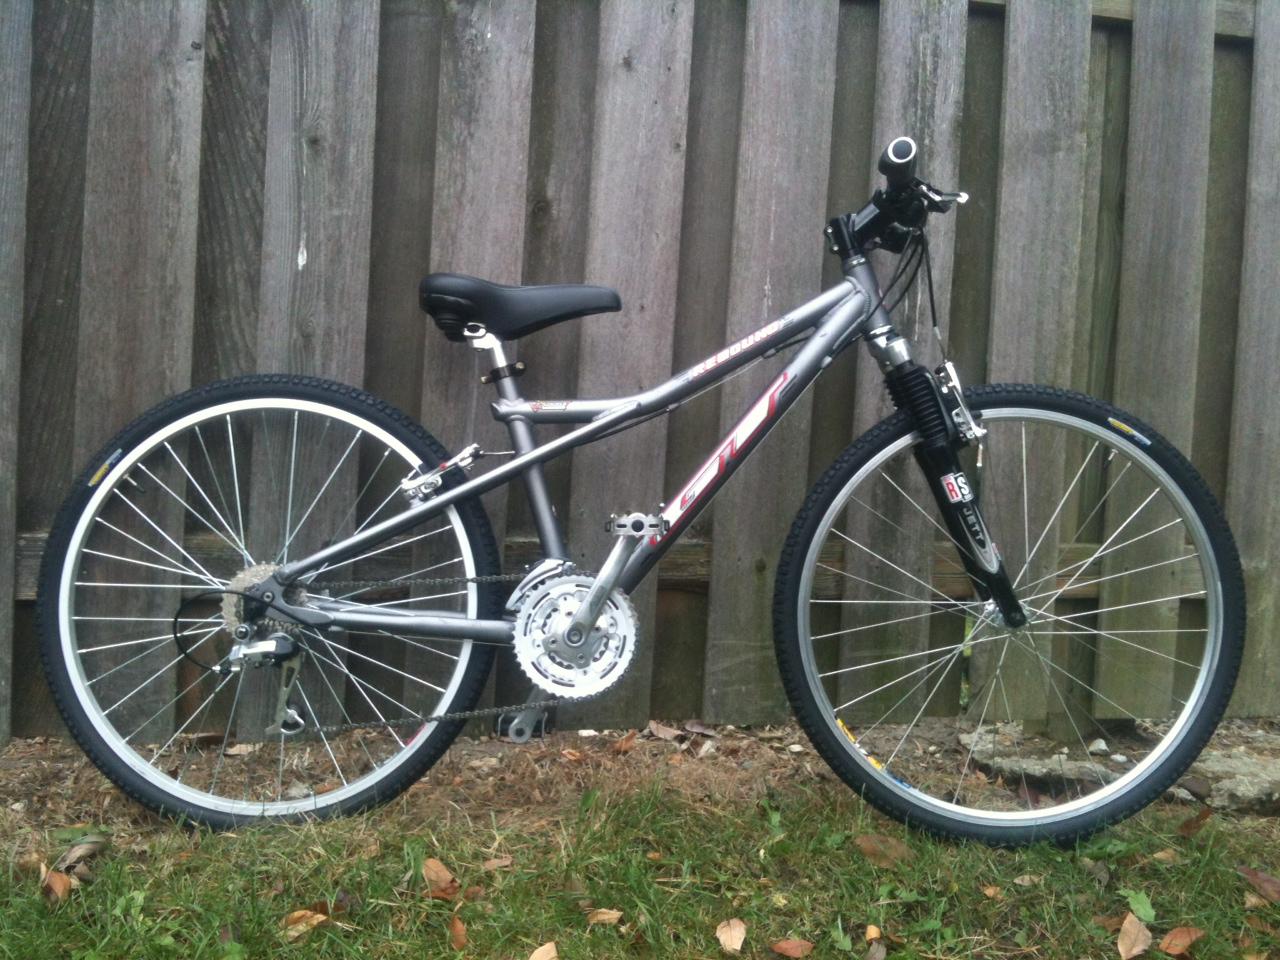 John S Bicycle Restorations Restored Gt Rebound Mountain Bike For